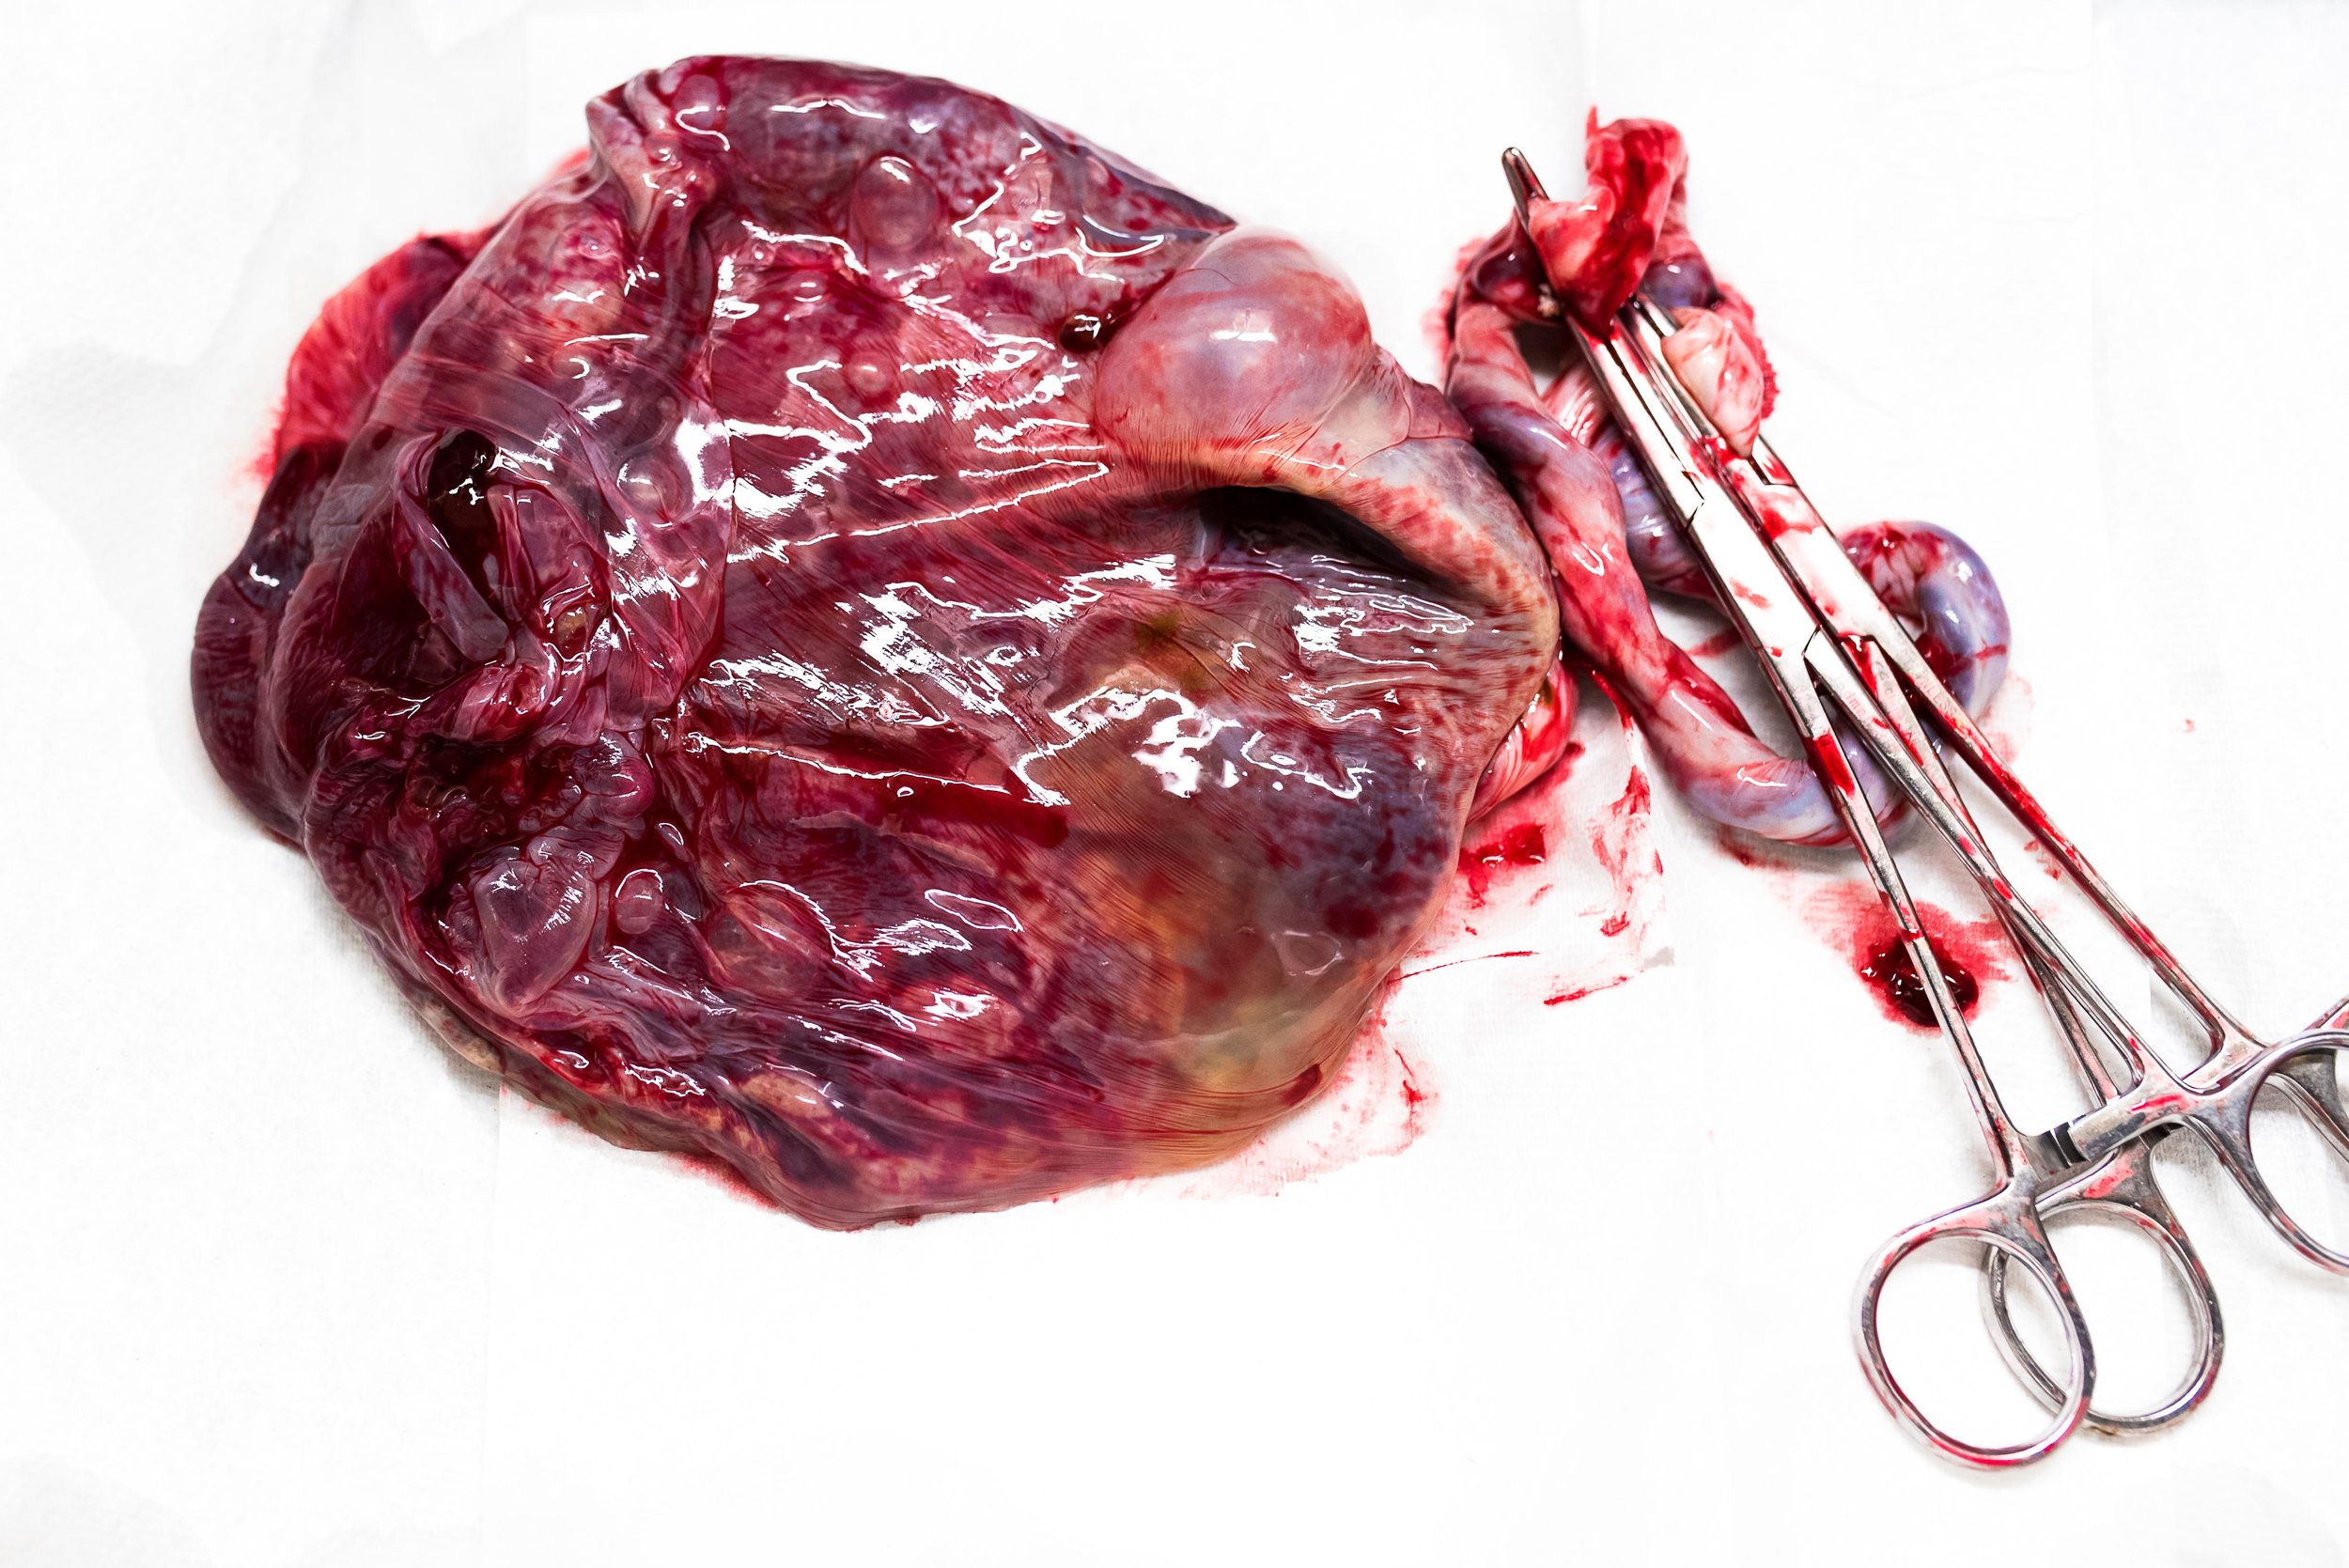 placenta on white background